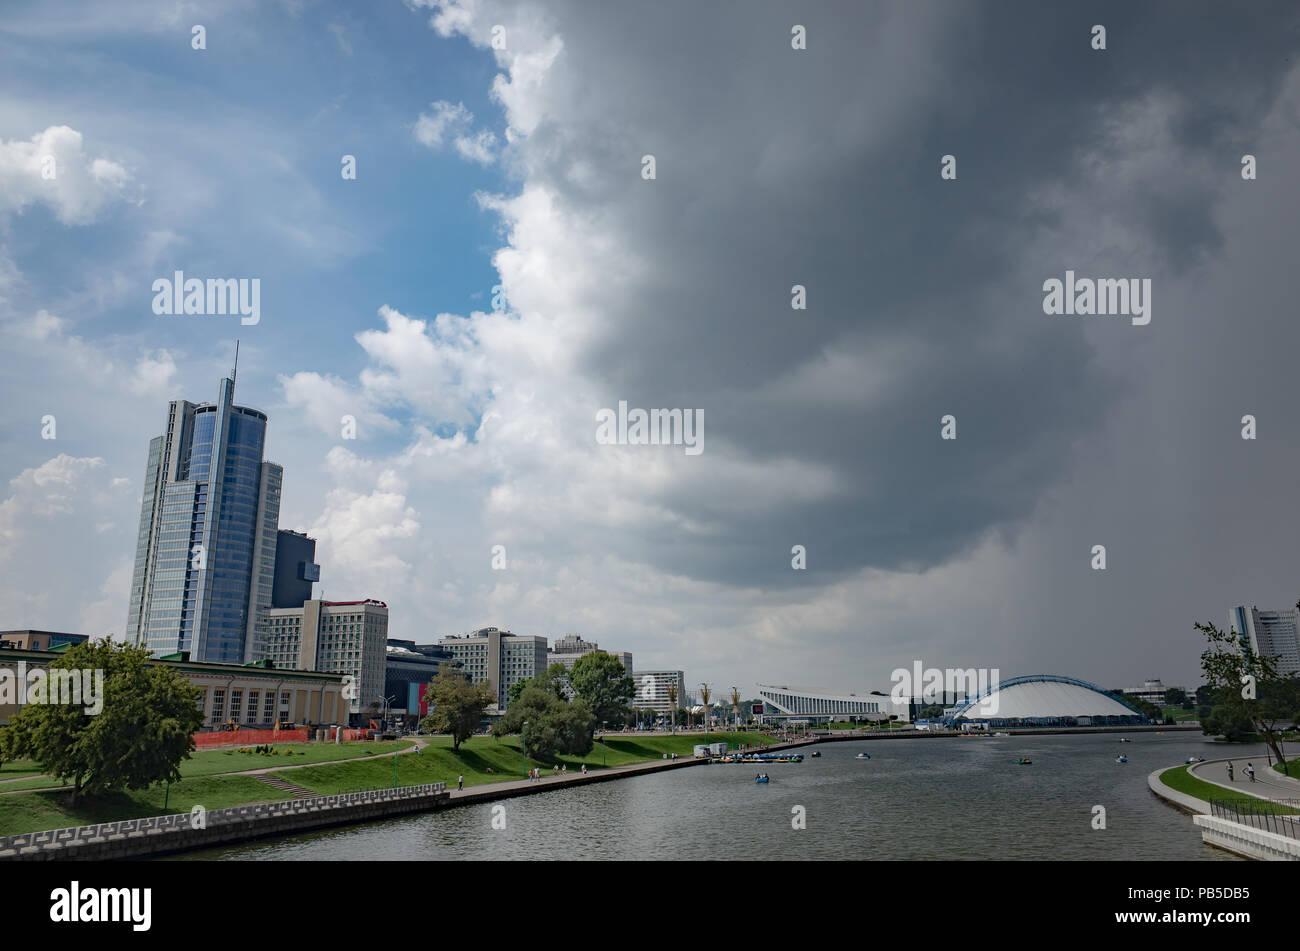 Rivers in Minsk: Svisloch, Loshitsa, Slepnya